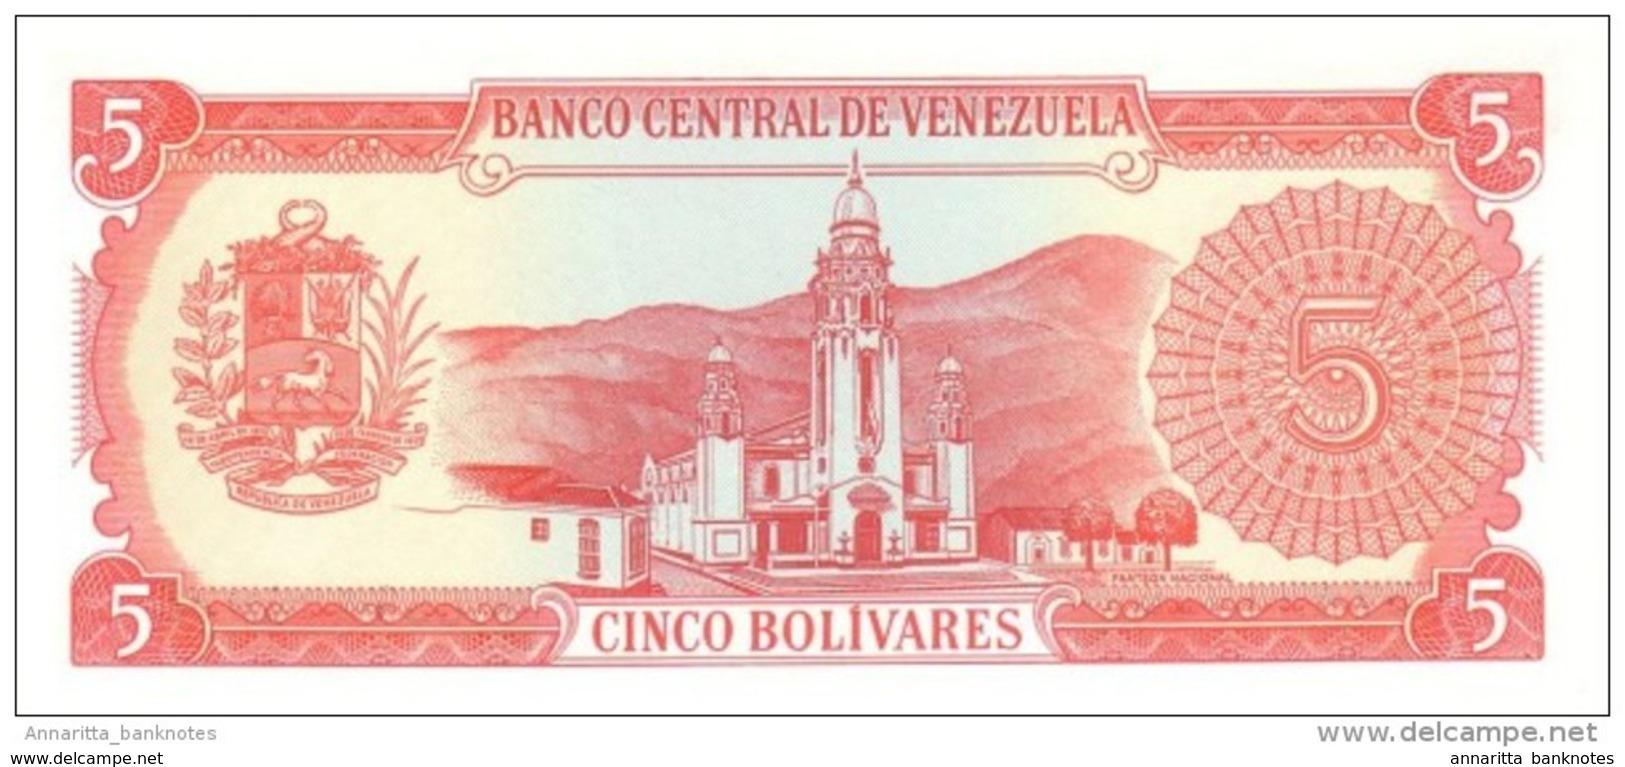 VENEZUELA 5 BOLIVARES 1989 P-70b NEUF 8 CHIFFRE S/N [ VE070b ] - Venezuela